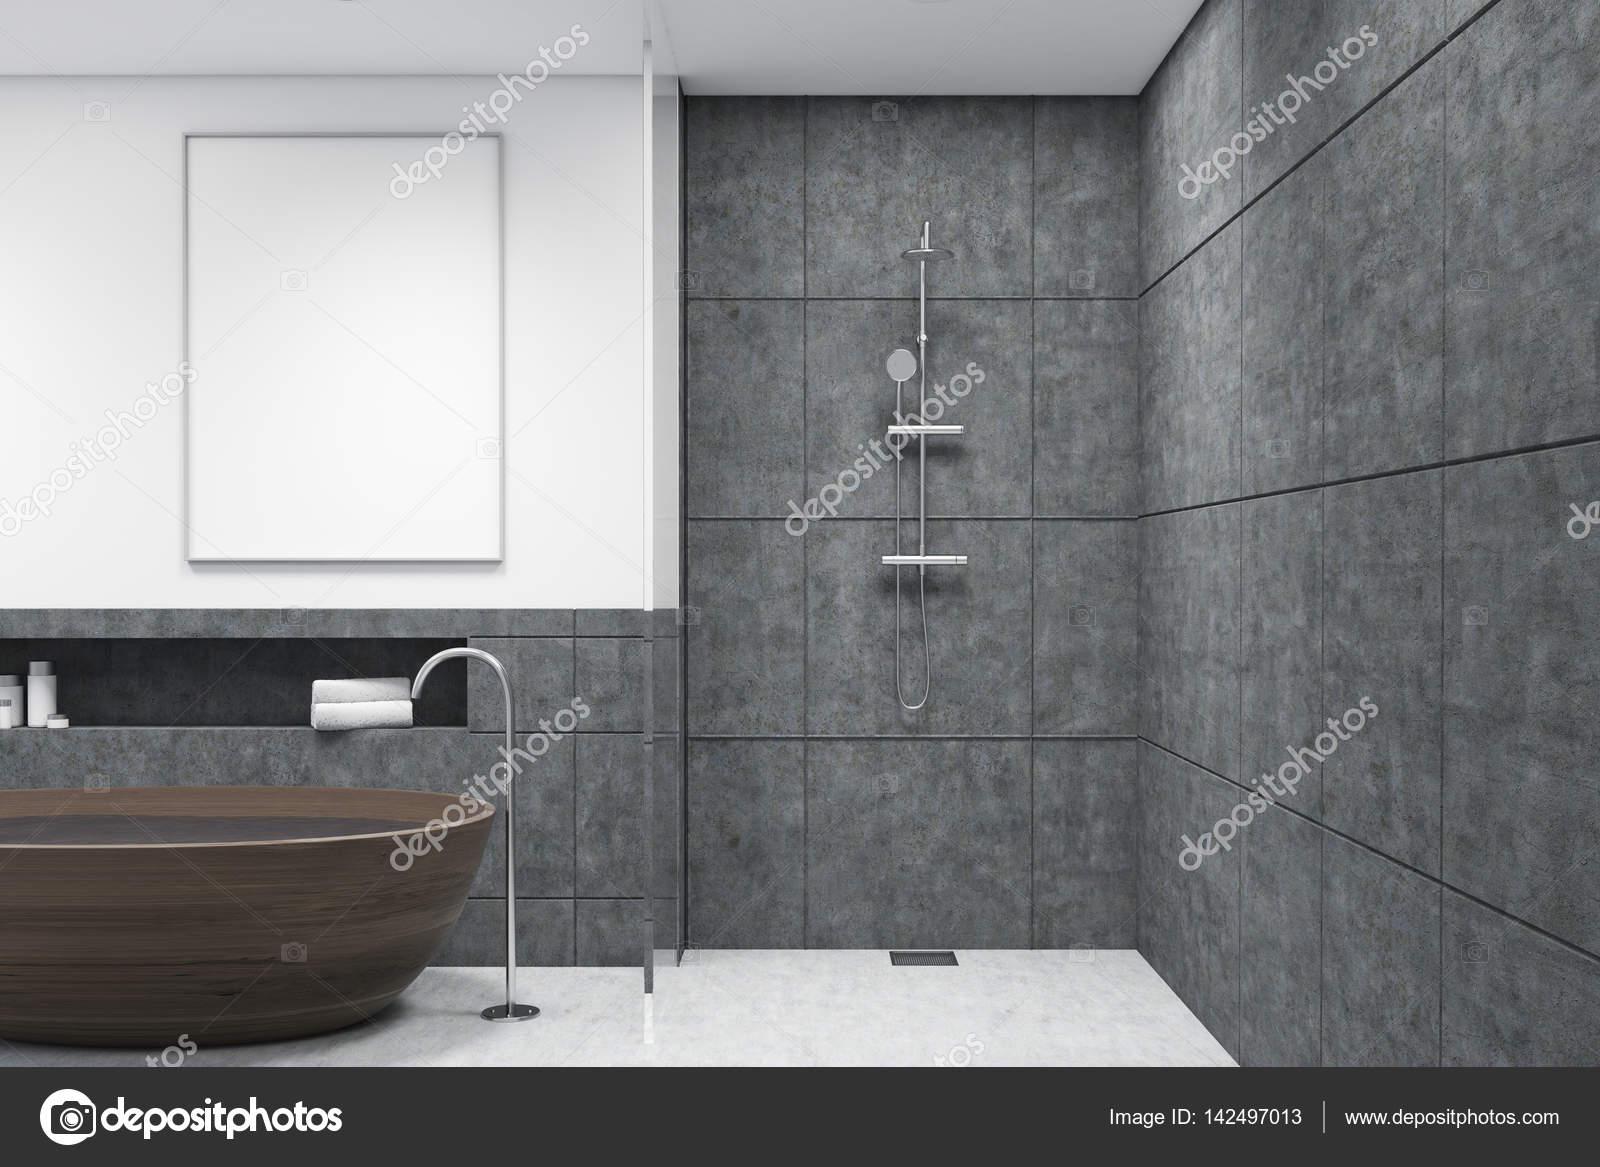 Badezimmer Mit Holzzuber Vertikale Plakat Dunkel Stockfoto